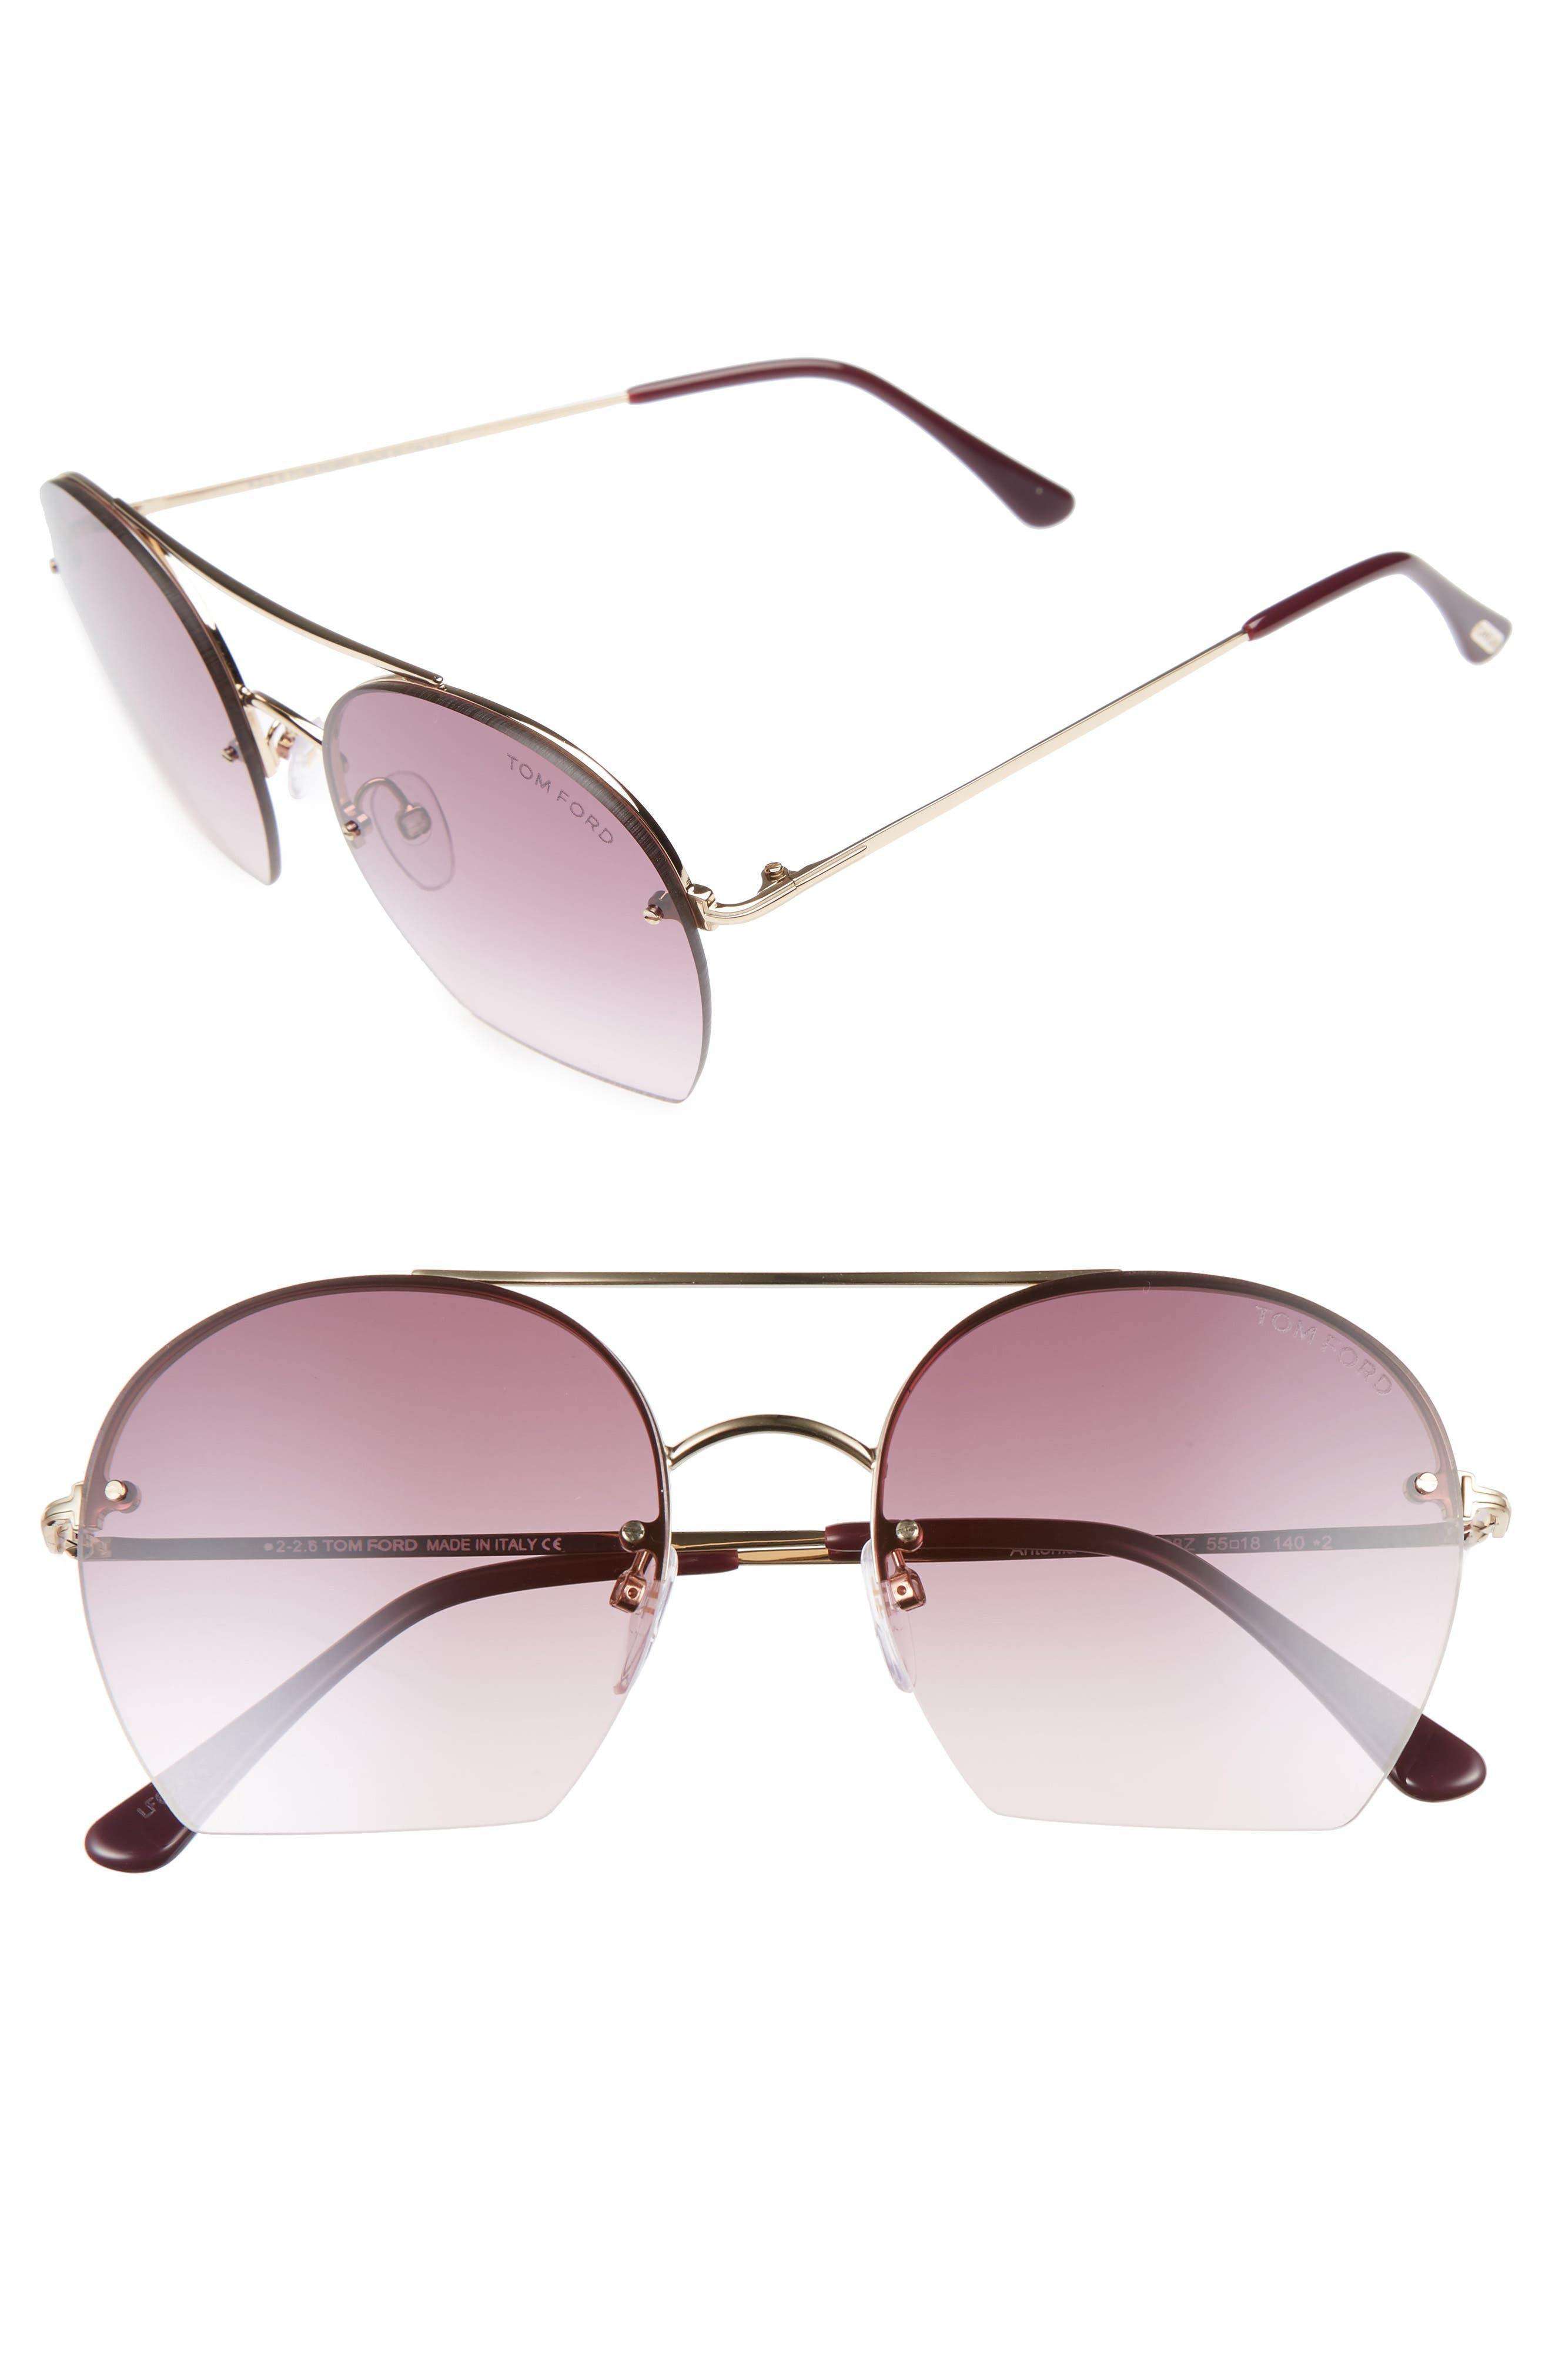 Antonia 55mm Gradient Lens Aviator Sunglasses,                         Main,                         color, Rose Gold/ Plum/ Gradient Pink